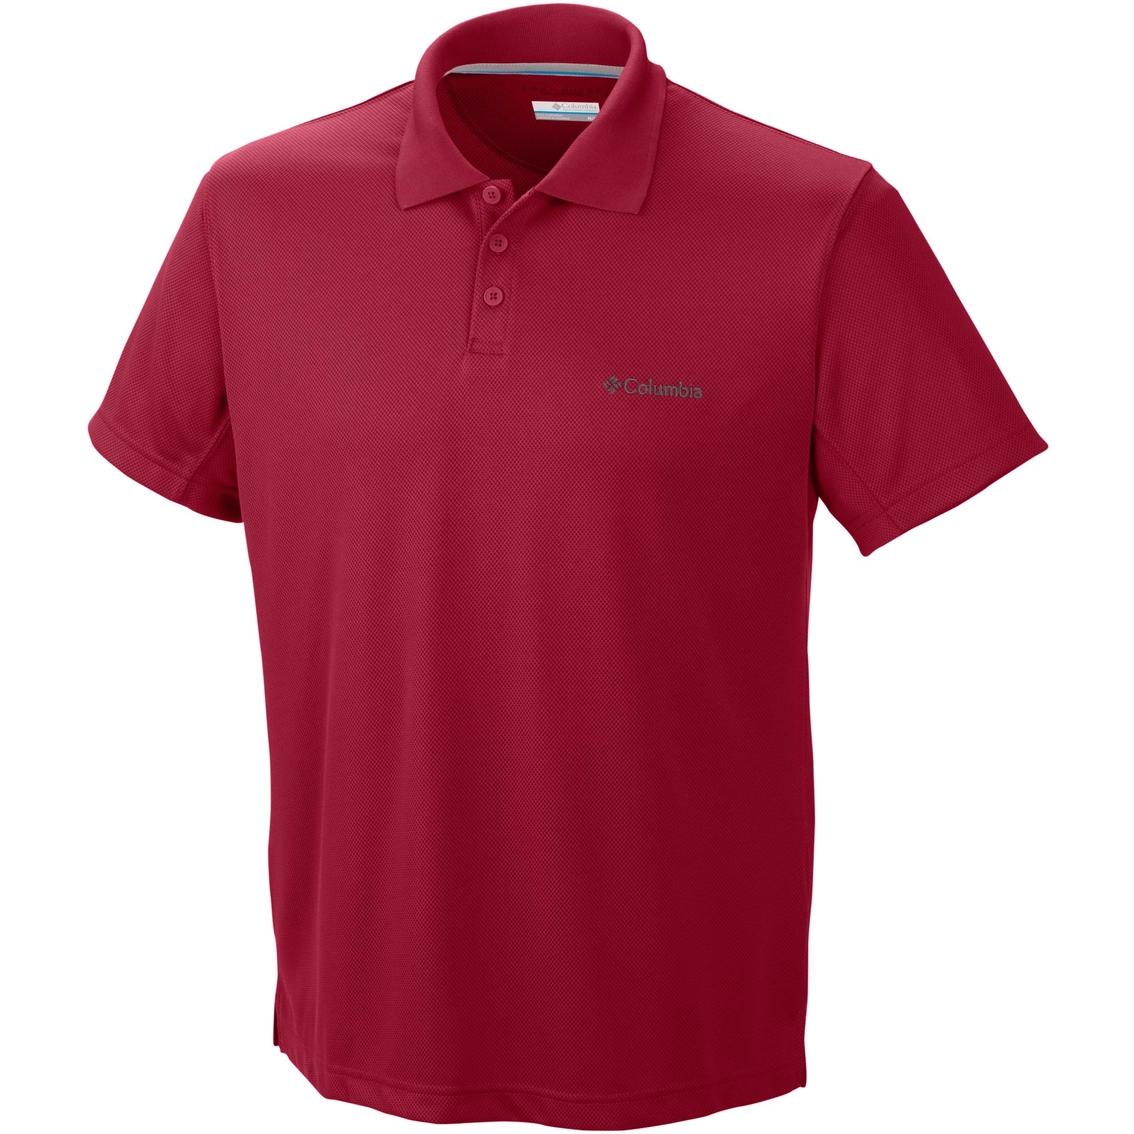 4e0a4c0ad Columbia New Utilizer Polo Shirt | Polos | Father's Day Shop | Shop ...